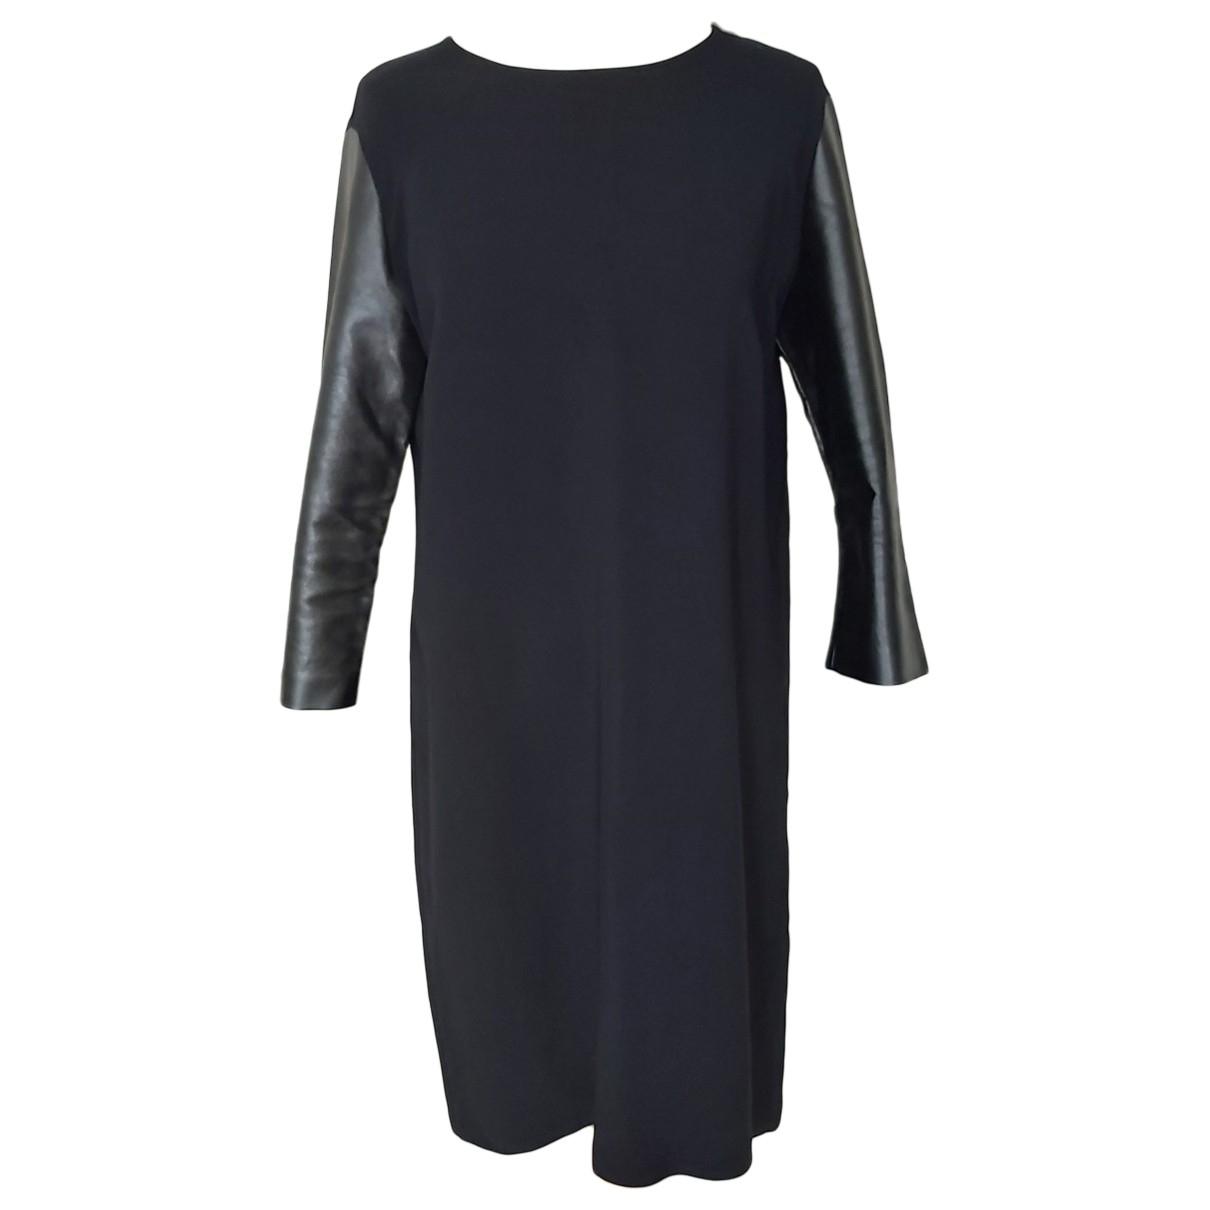 Stella Mccartney \N Black Cotton dress for Women 46 IT